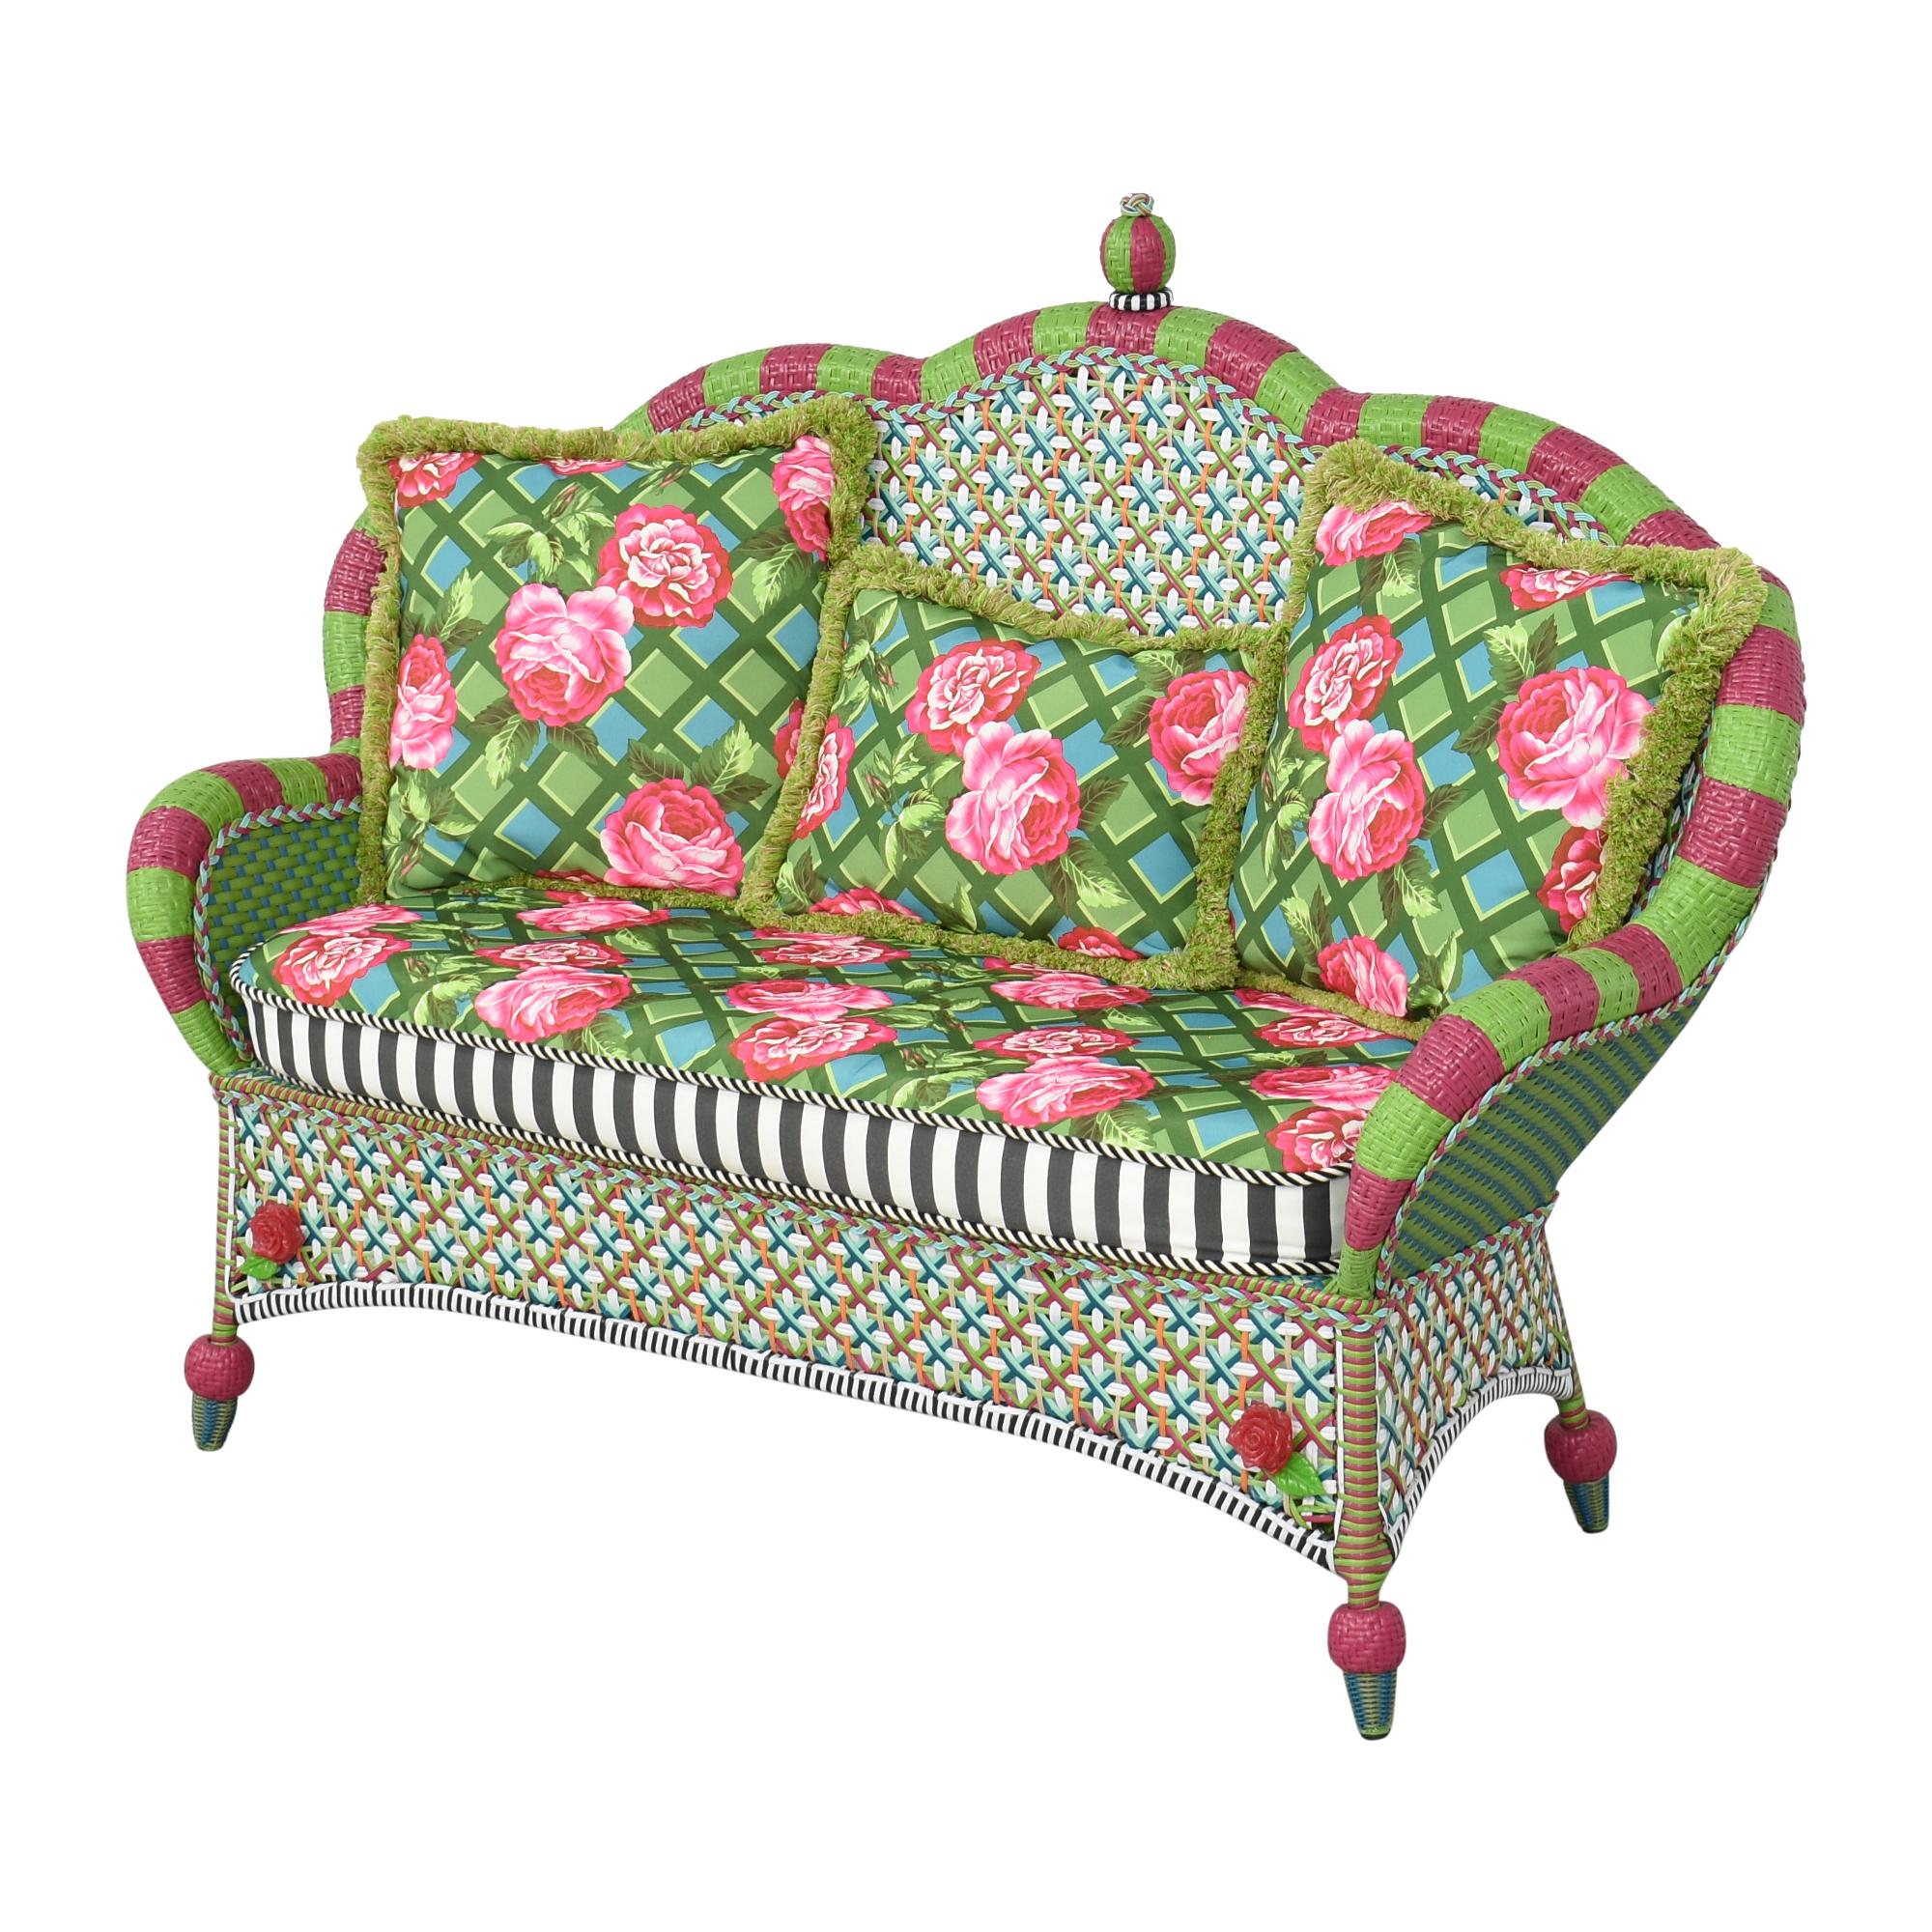 MacKenzie-Childs Patterned Sofa / Classic Sofas